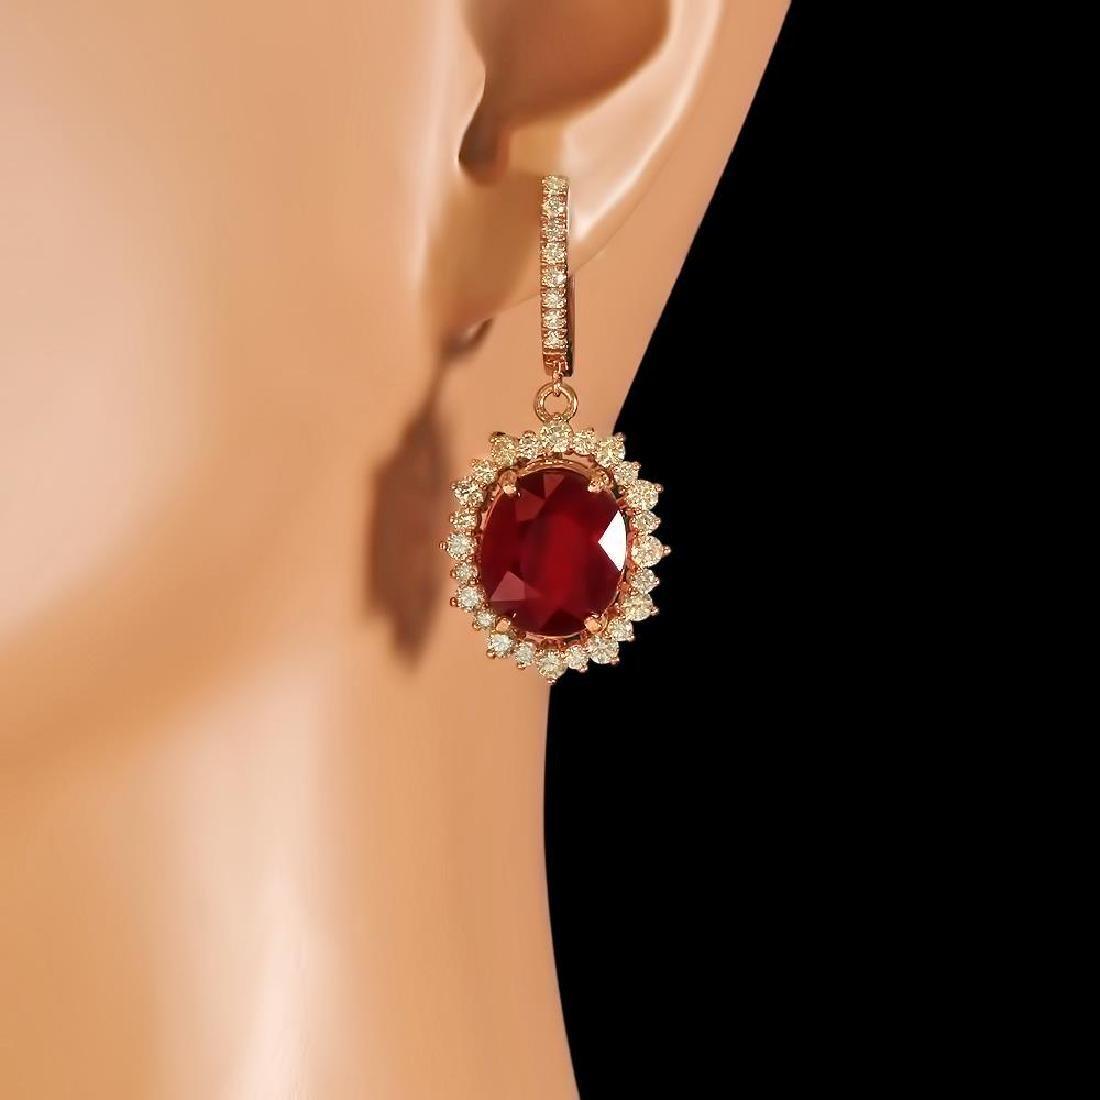 14k Gold 18.88ct Ruby 2.65ct Diamond Earrings - 2